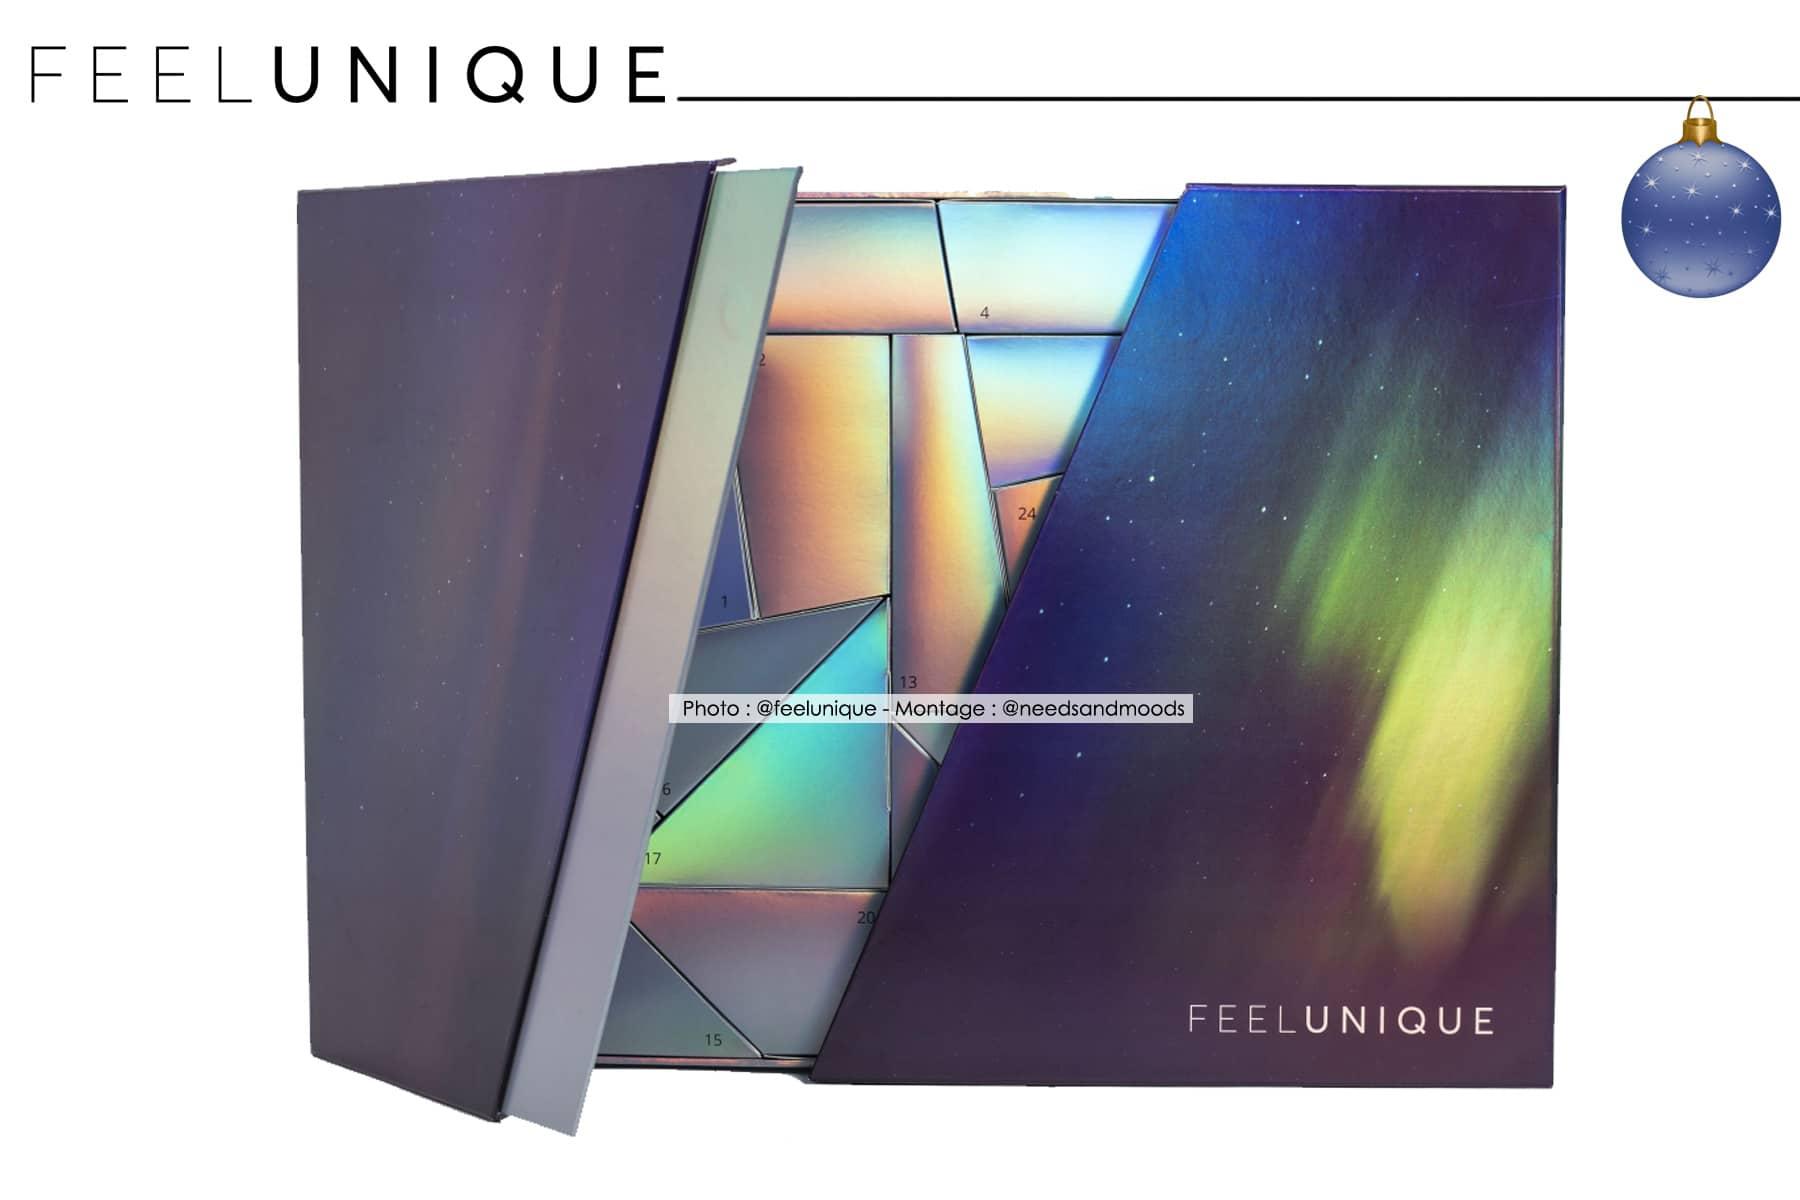 Calendrier Prix.Calendrier De L Avent Feelunique 2019 Avis Contenu Prix